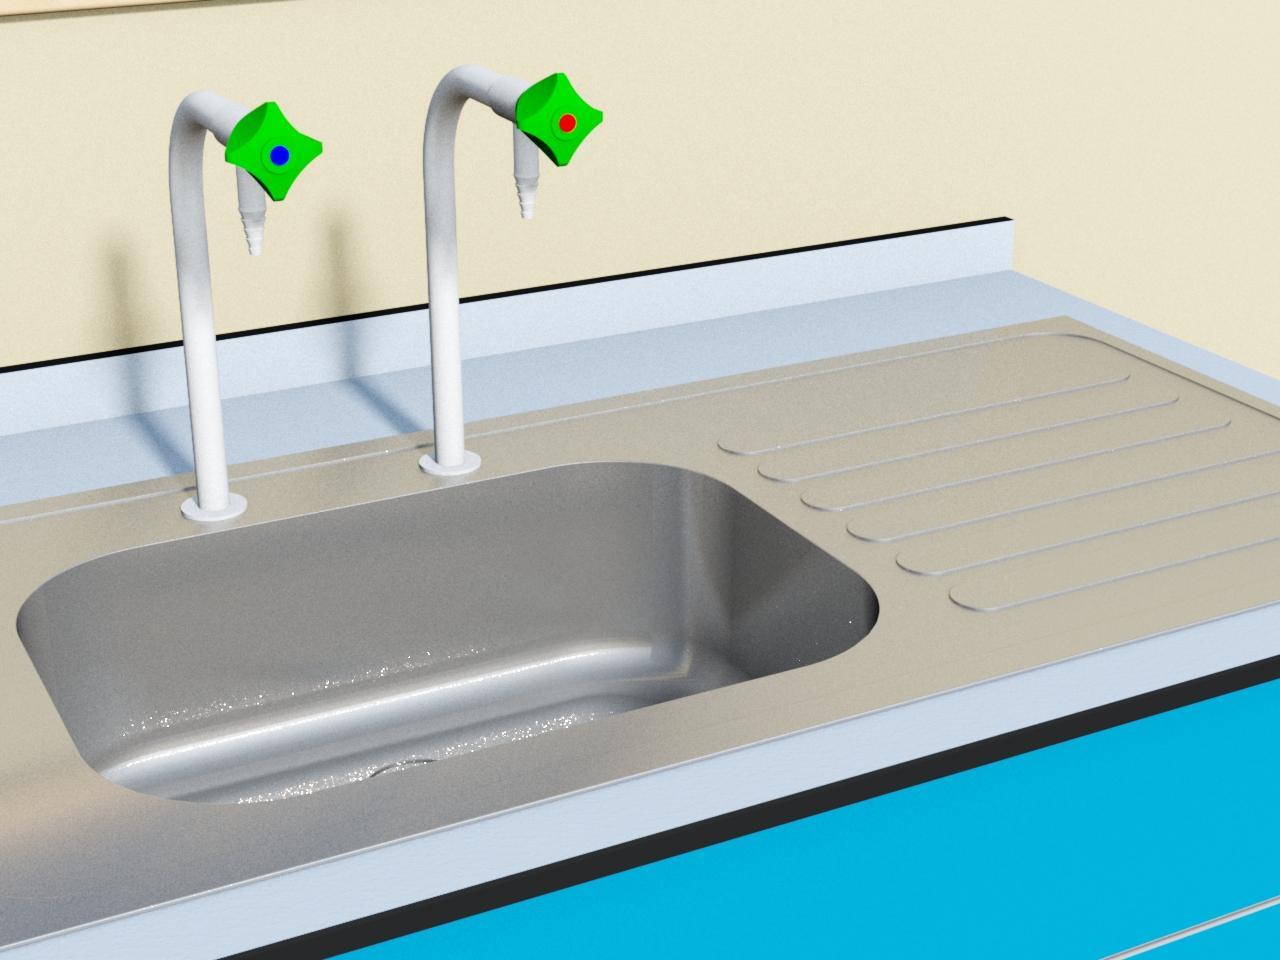 Laboratory Inset Sink Amp Drainers Kinetic Laboratories